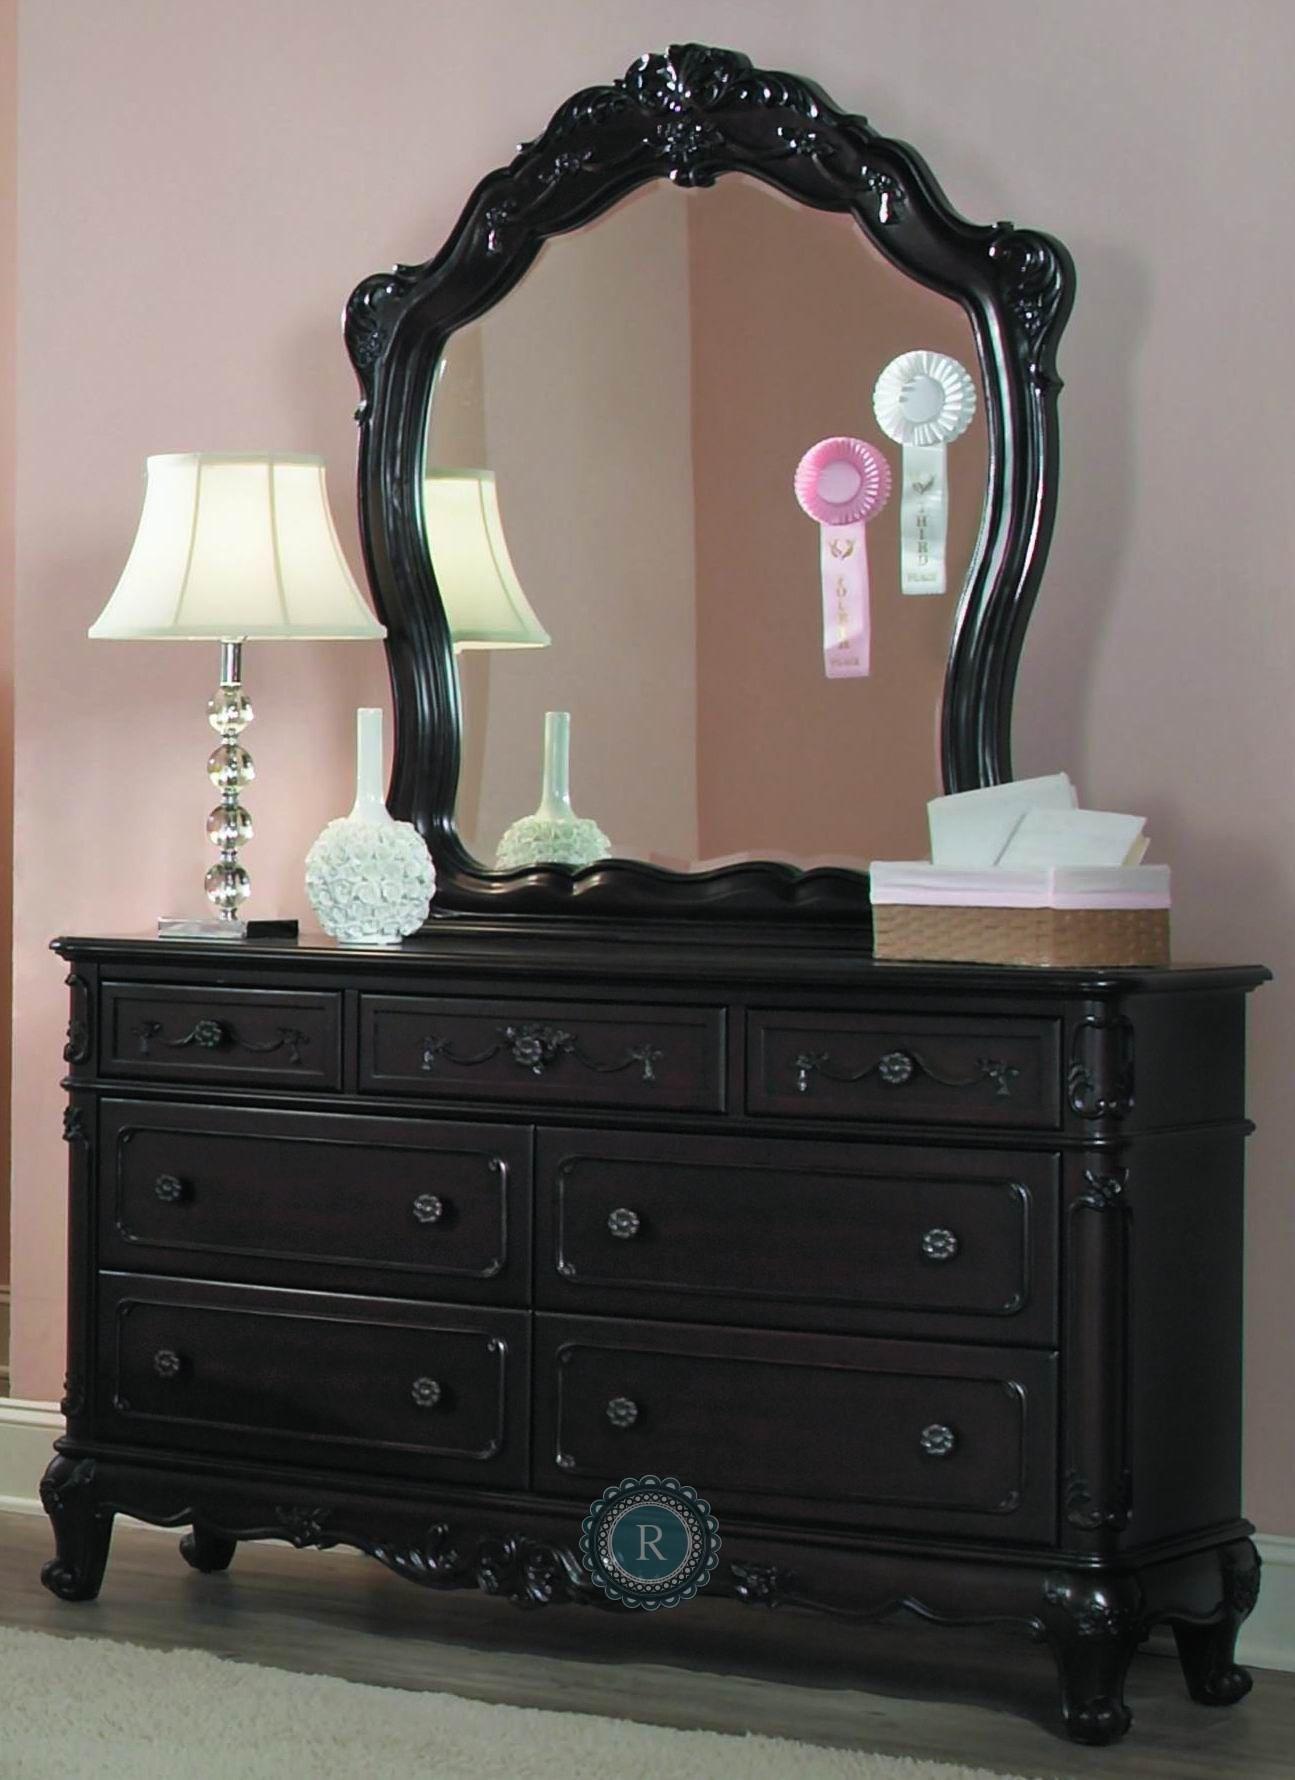 Cinderella Dark Cherry Poster Bedroom Set from Homelegance